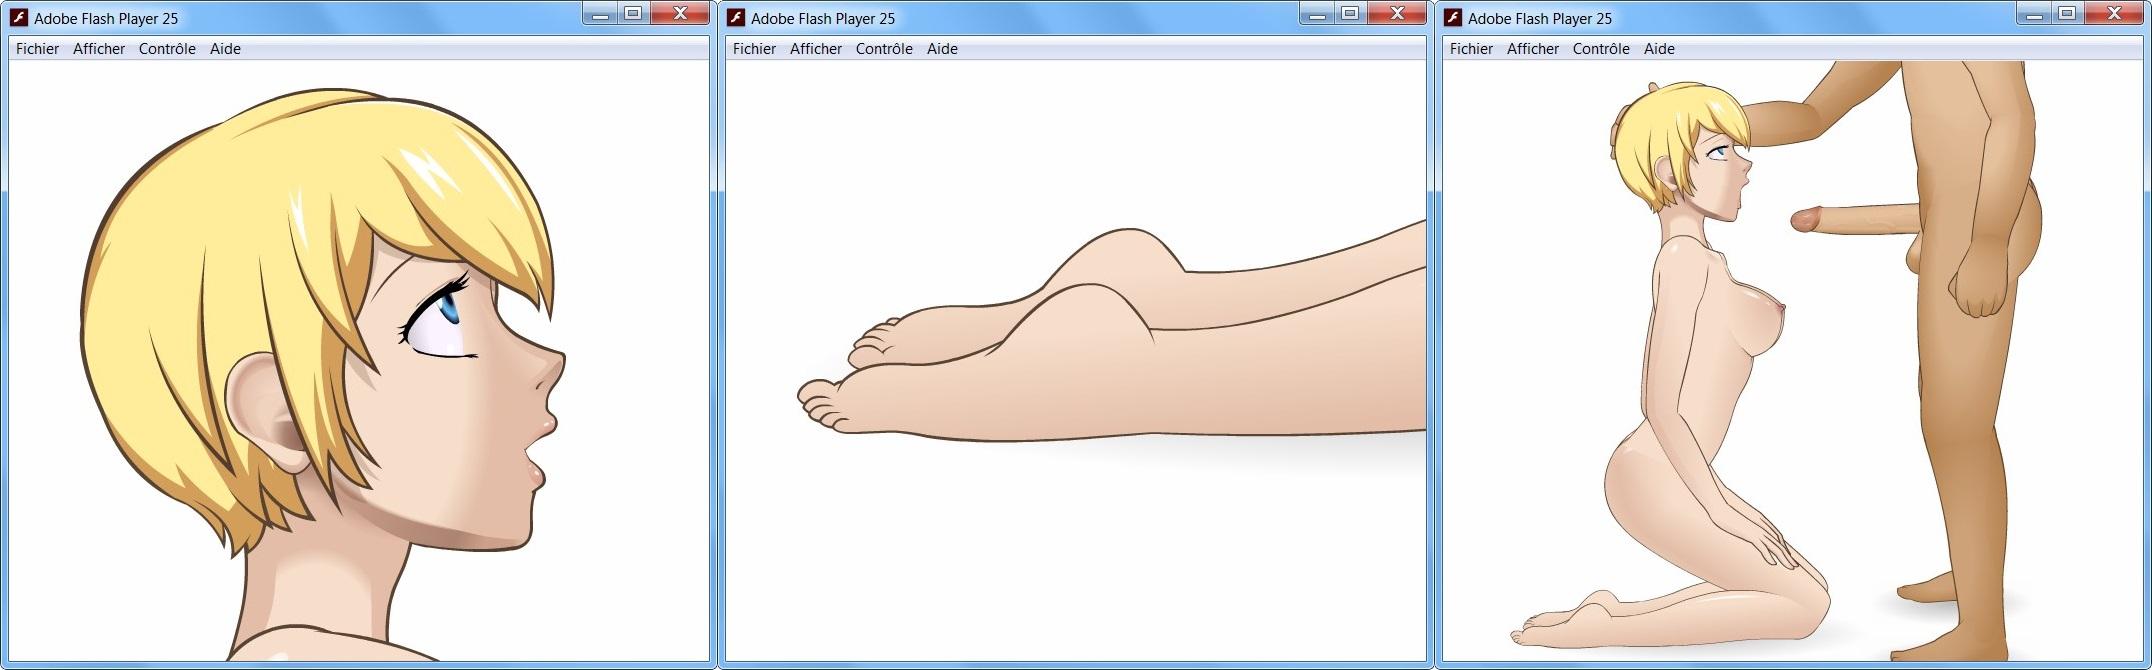 Loader - Screenshot Positions - example.jpg